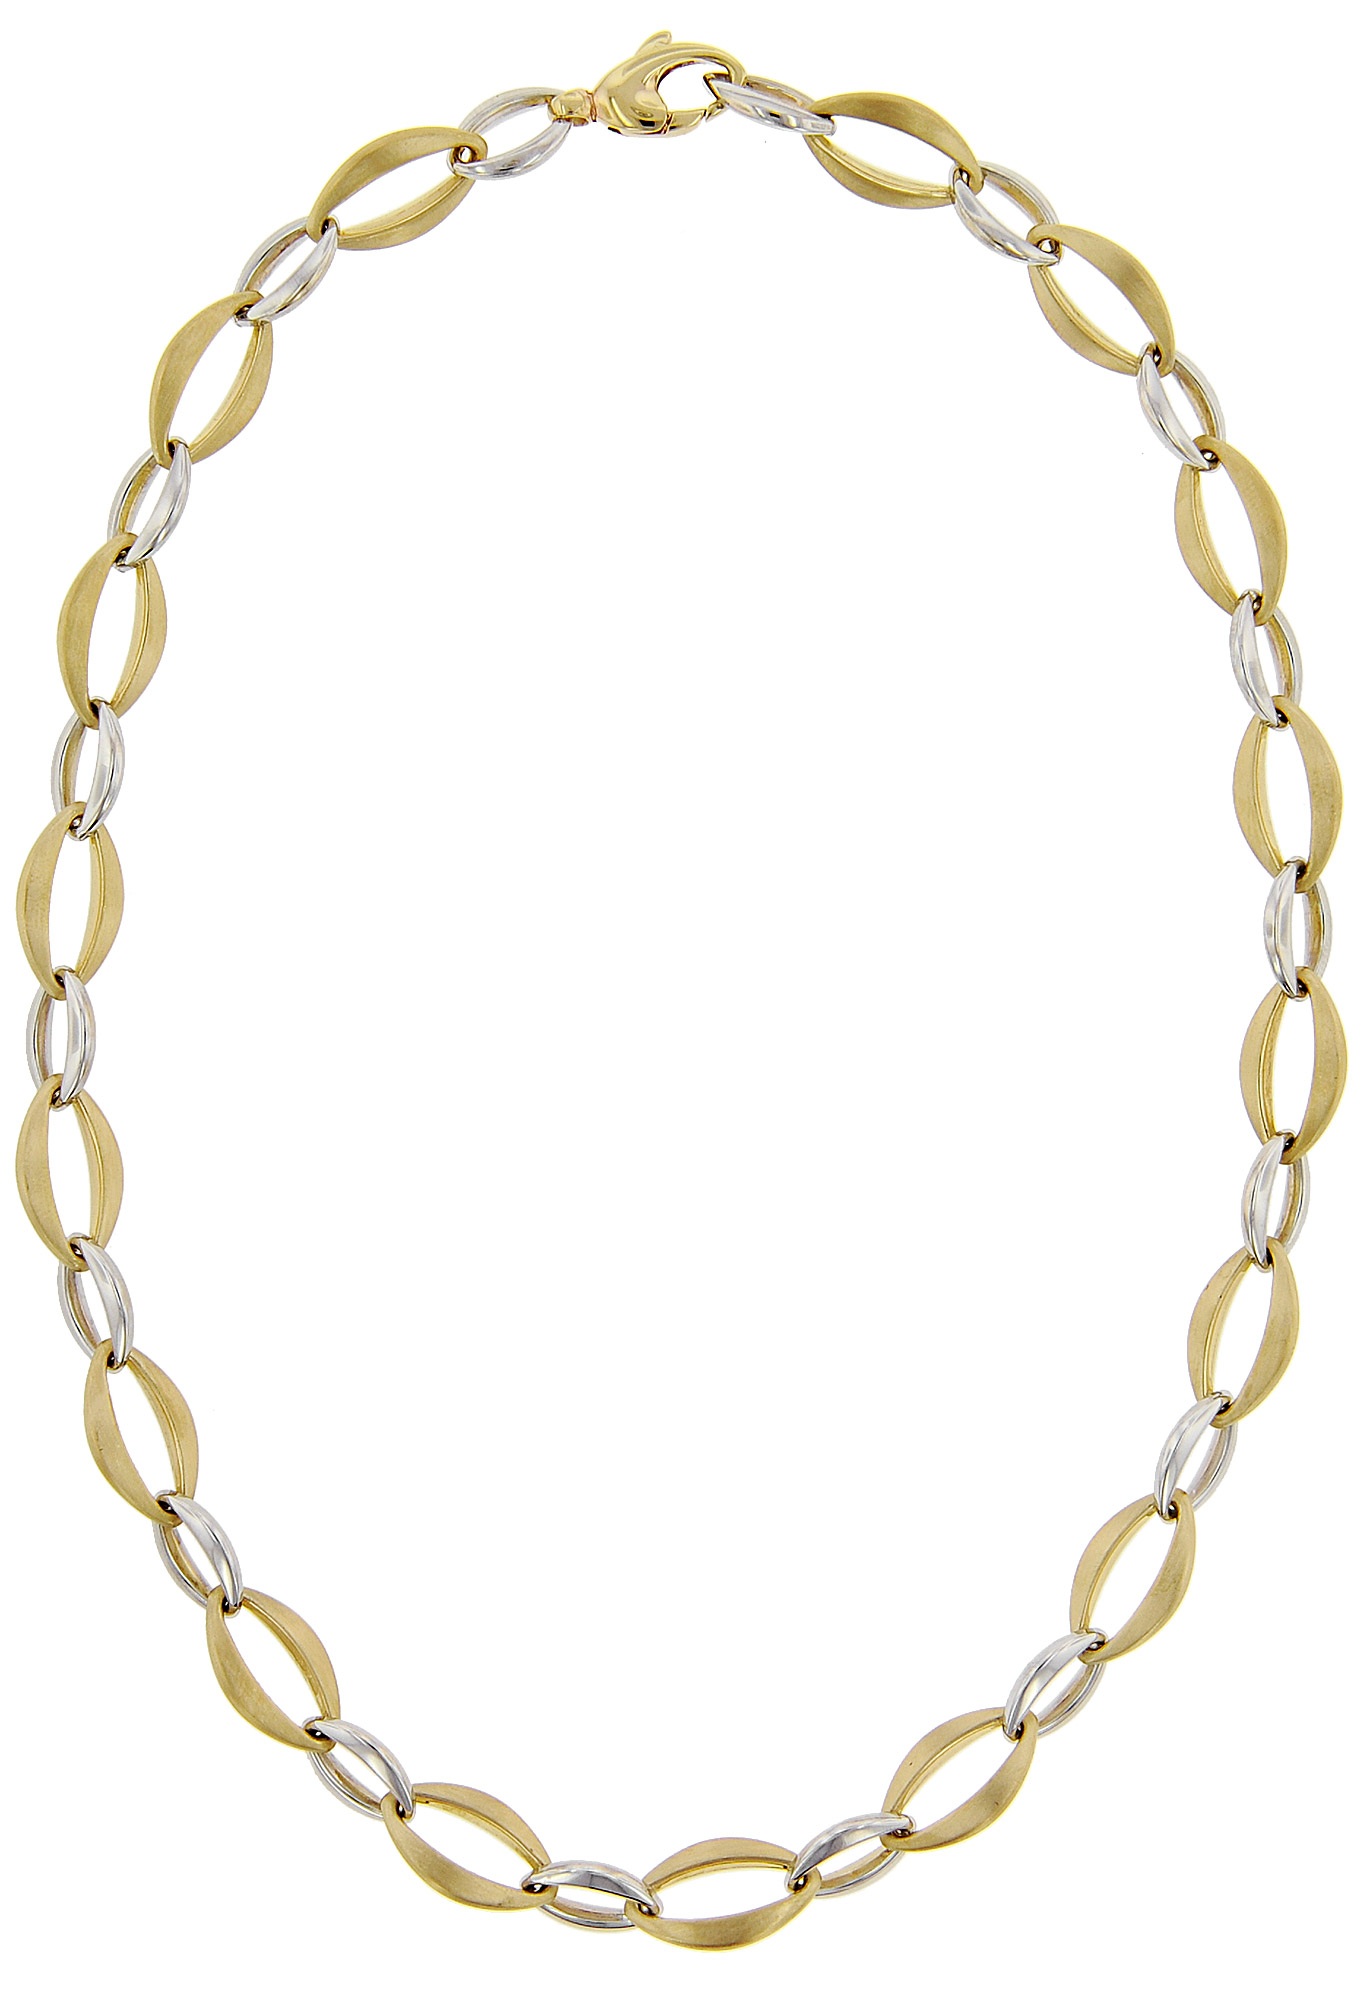 bei Uhrcenter: Elaine Firenze 11111C Gold Damen-Halskette - Schmuck